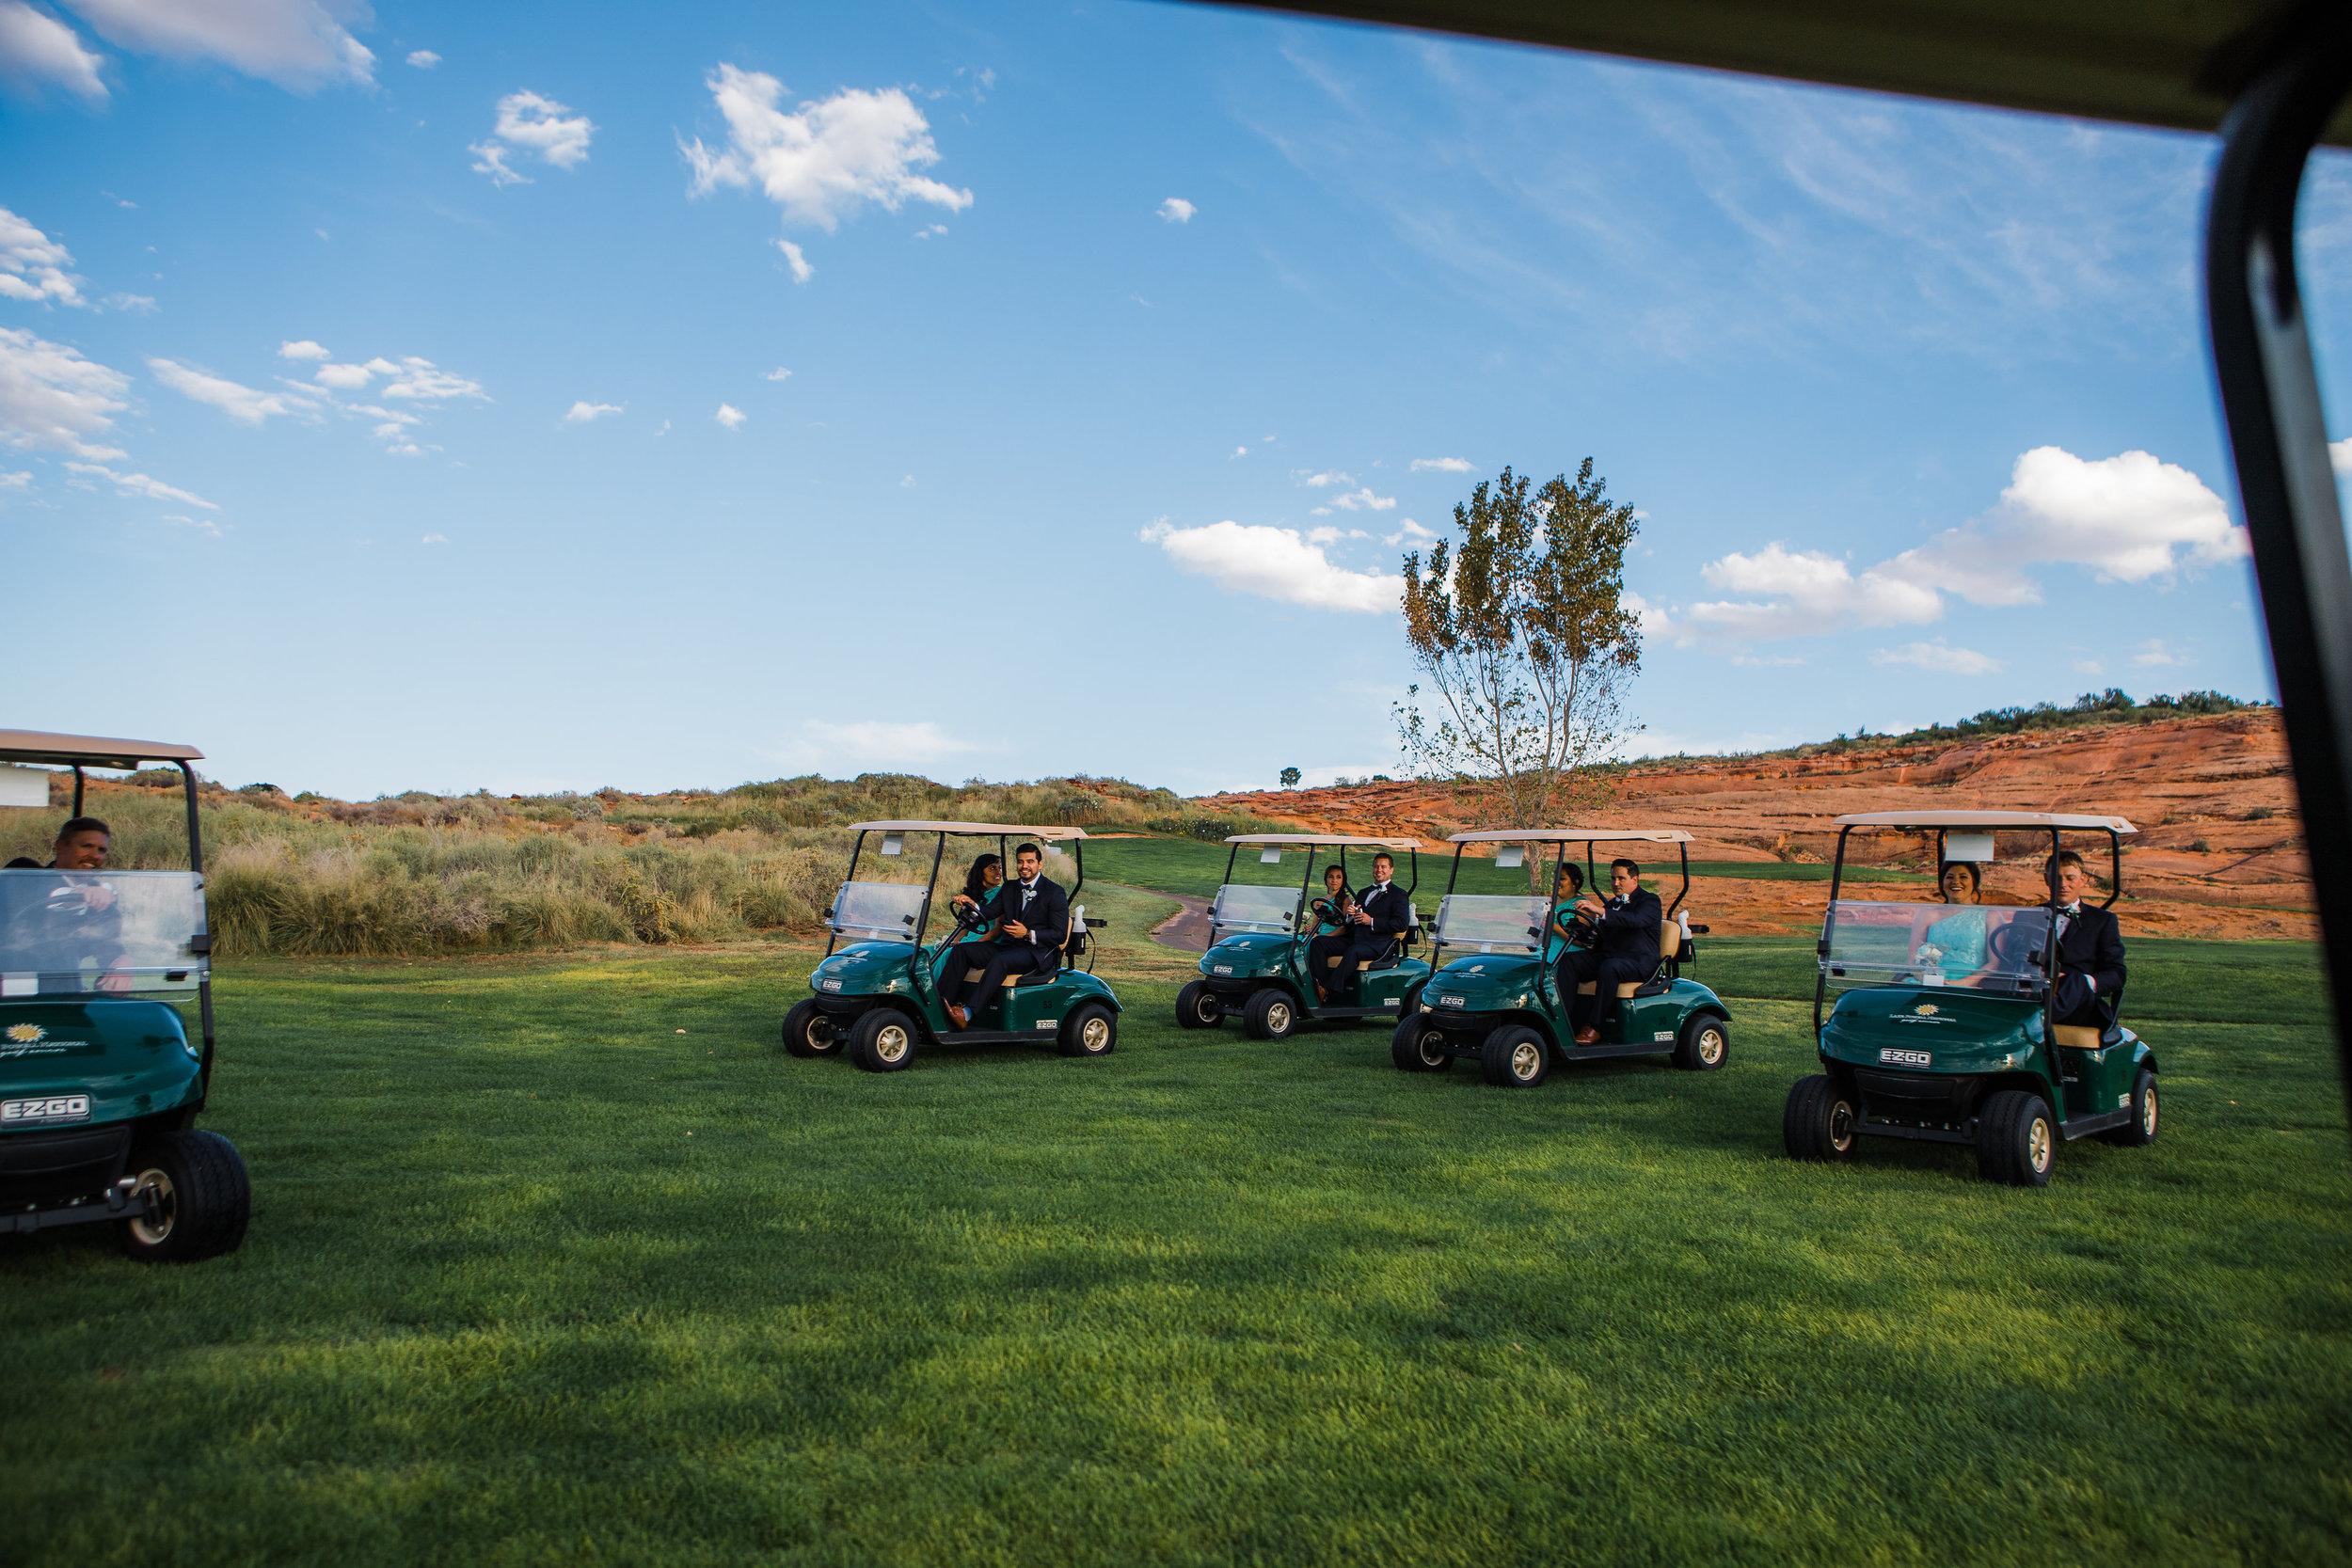 Wedding Party Golf Cart Ride